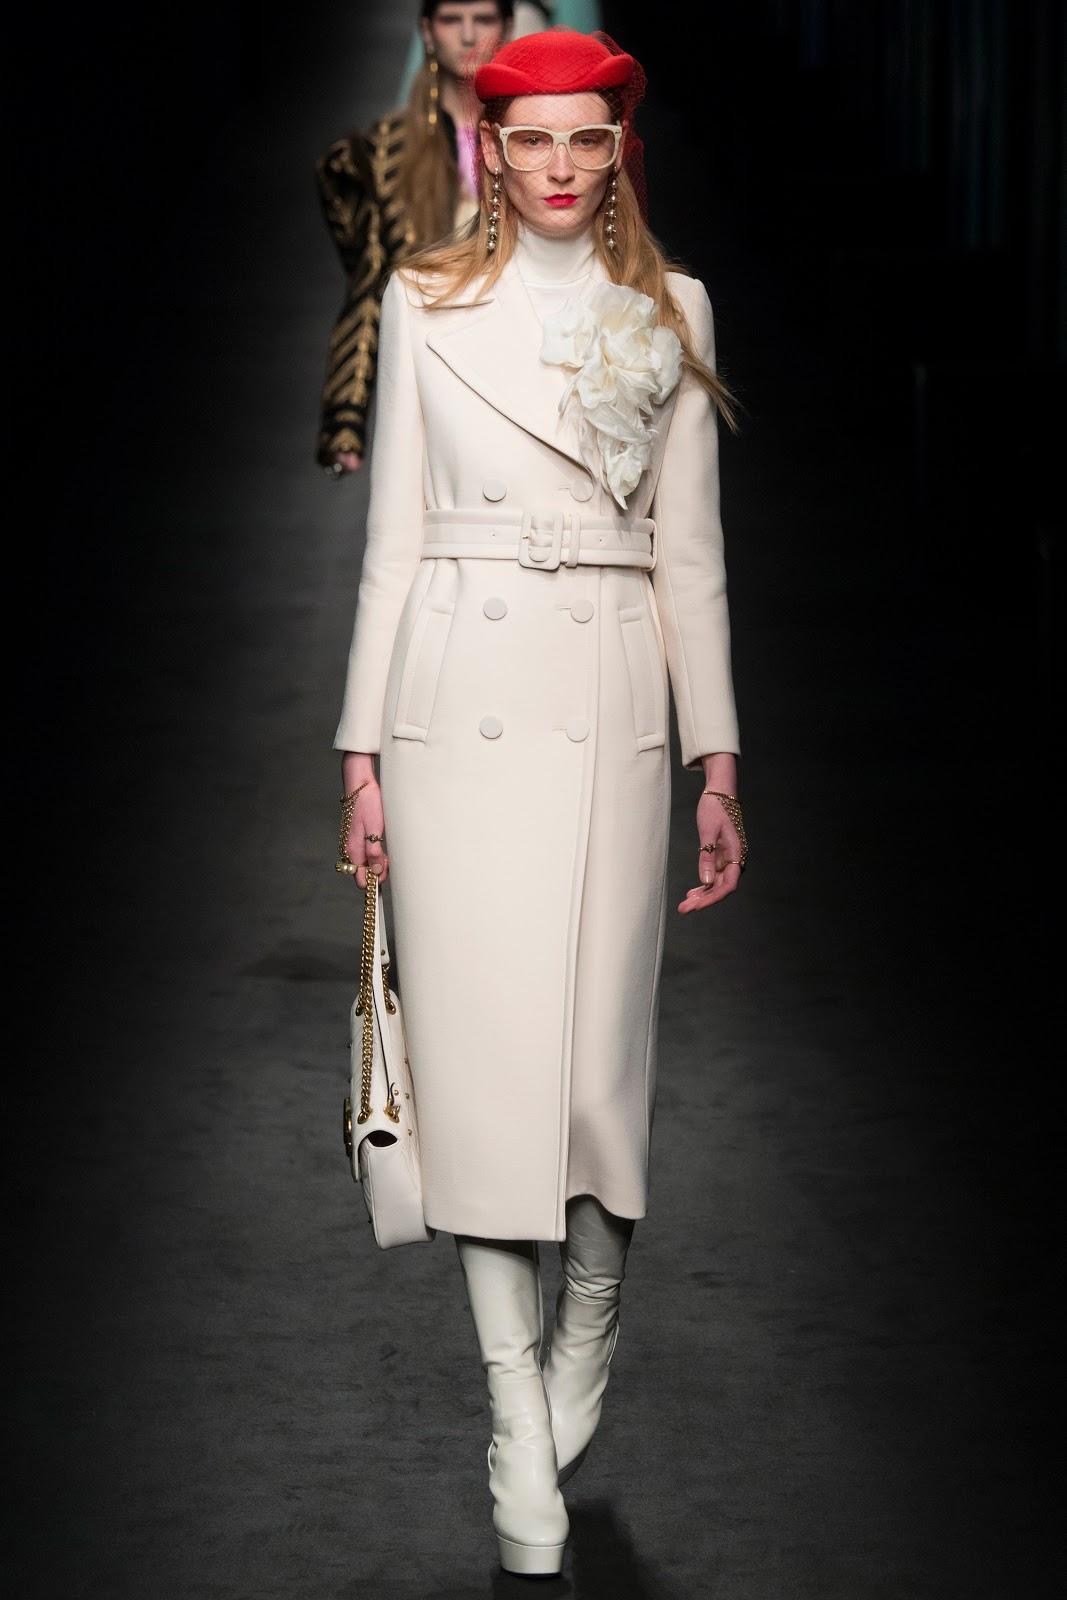 Fashion runway gucci fall 2016 ready to wear milan for Gucci milan fashion week